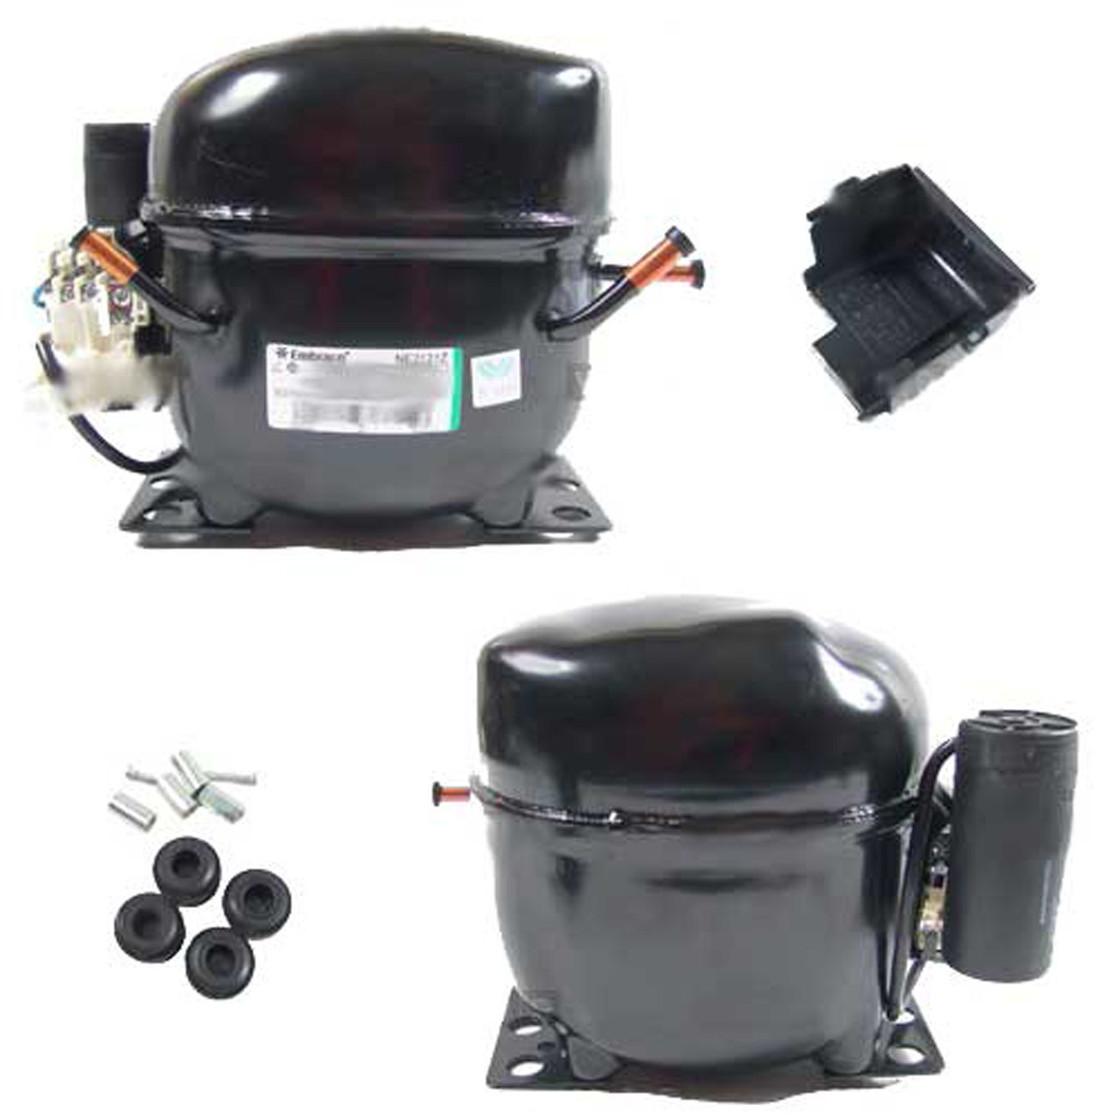 3S neu Verdichter Kompressor Aspera NE2121Z LBP R134a 220-240V CSIR Kältetechnik